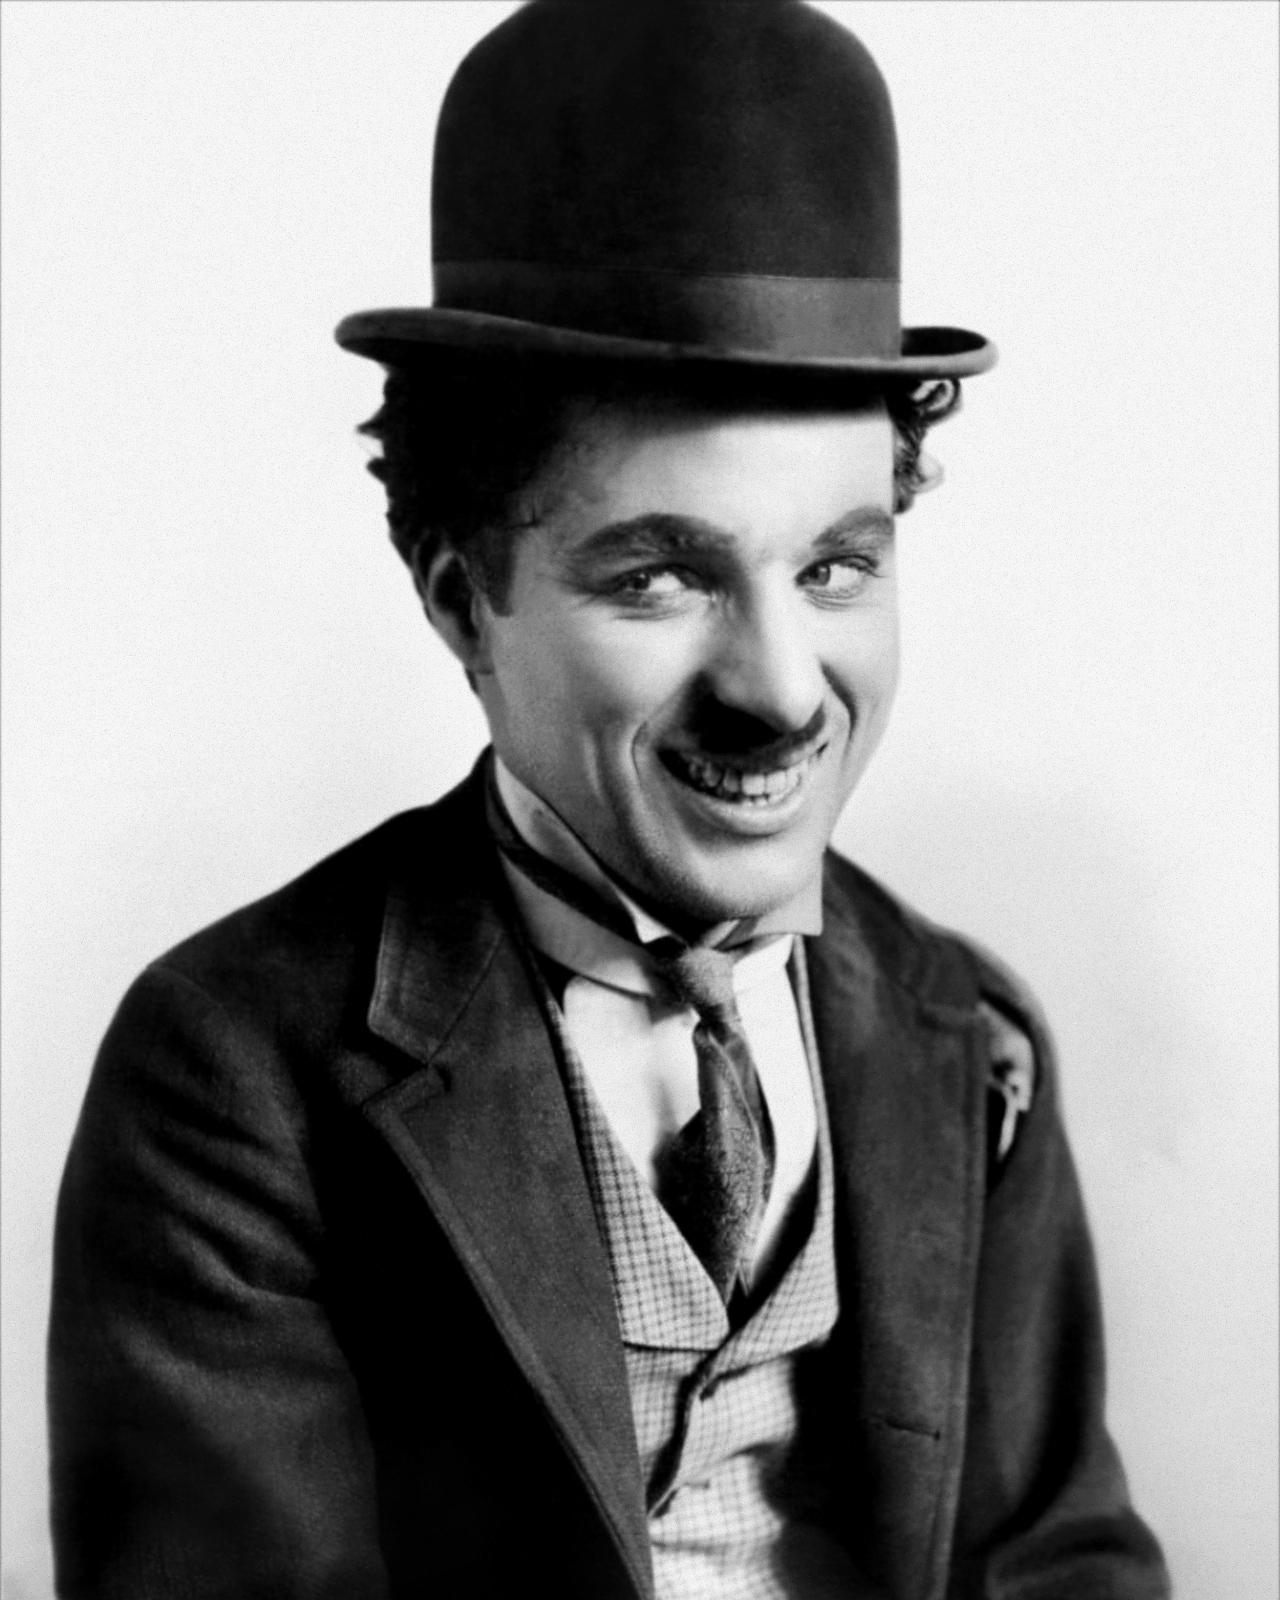 Imagen de Charles Chaplin interpretando a Charlot